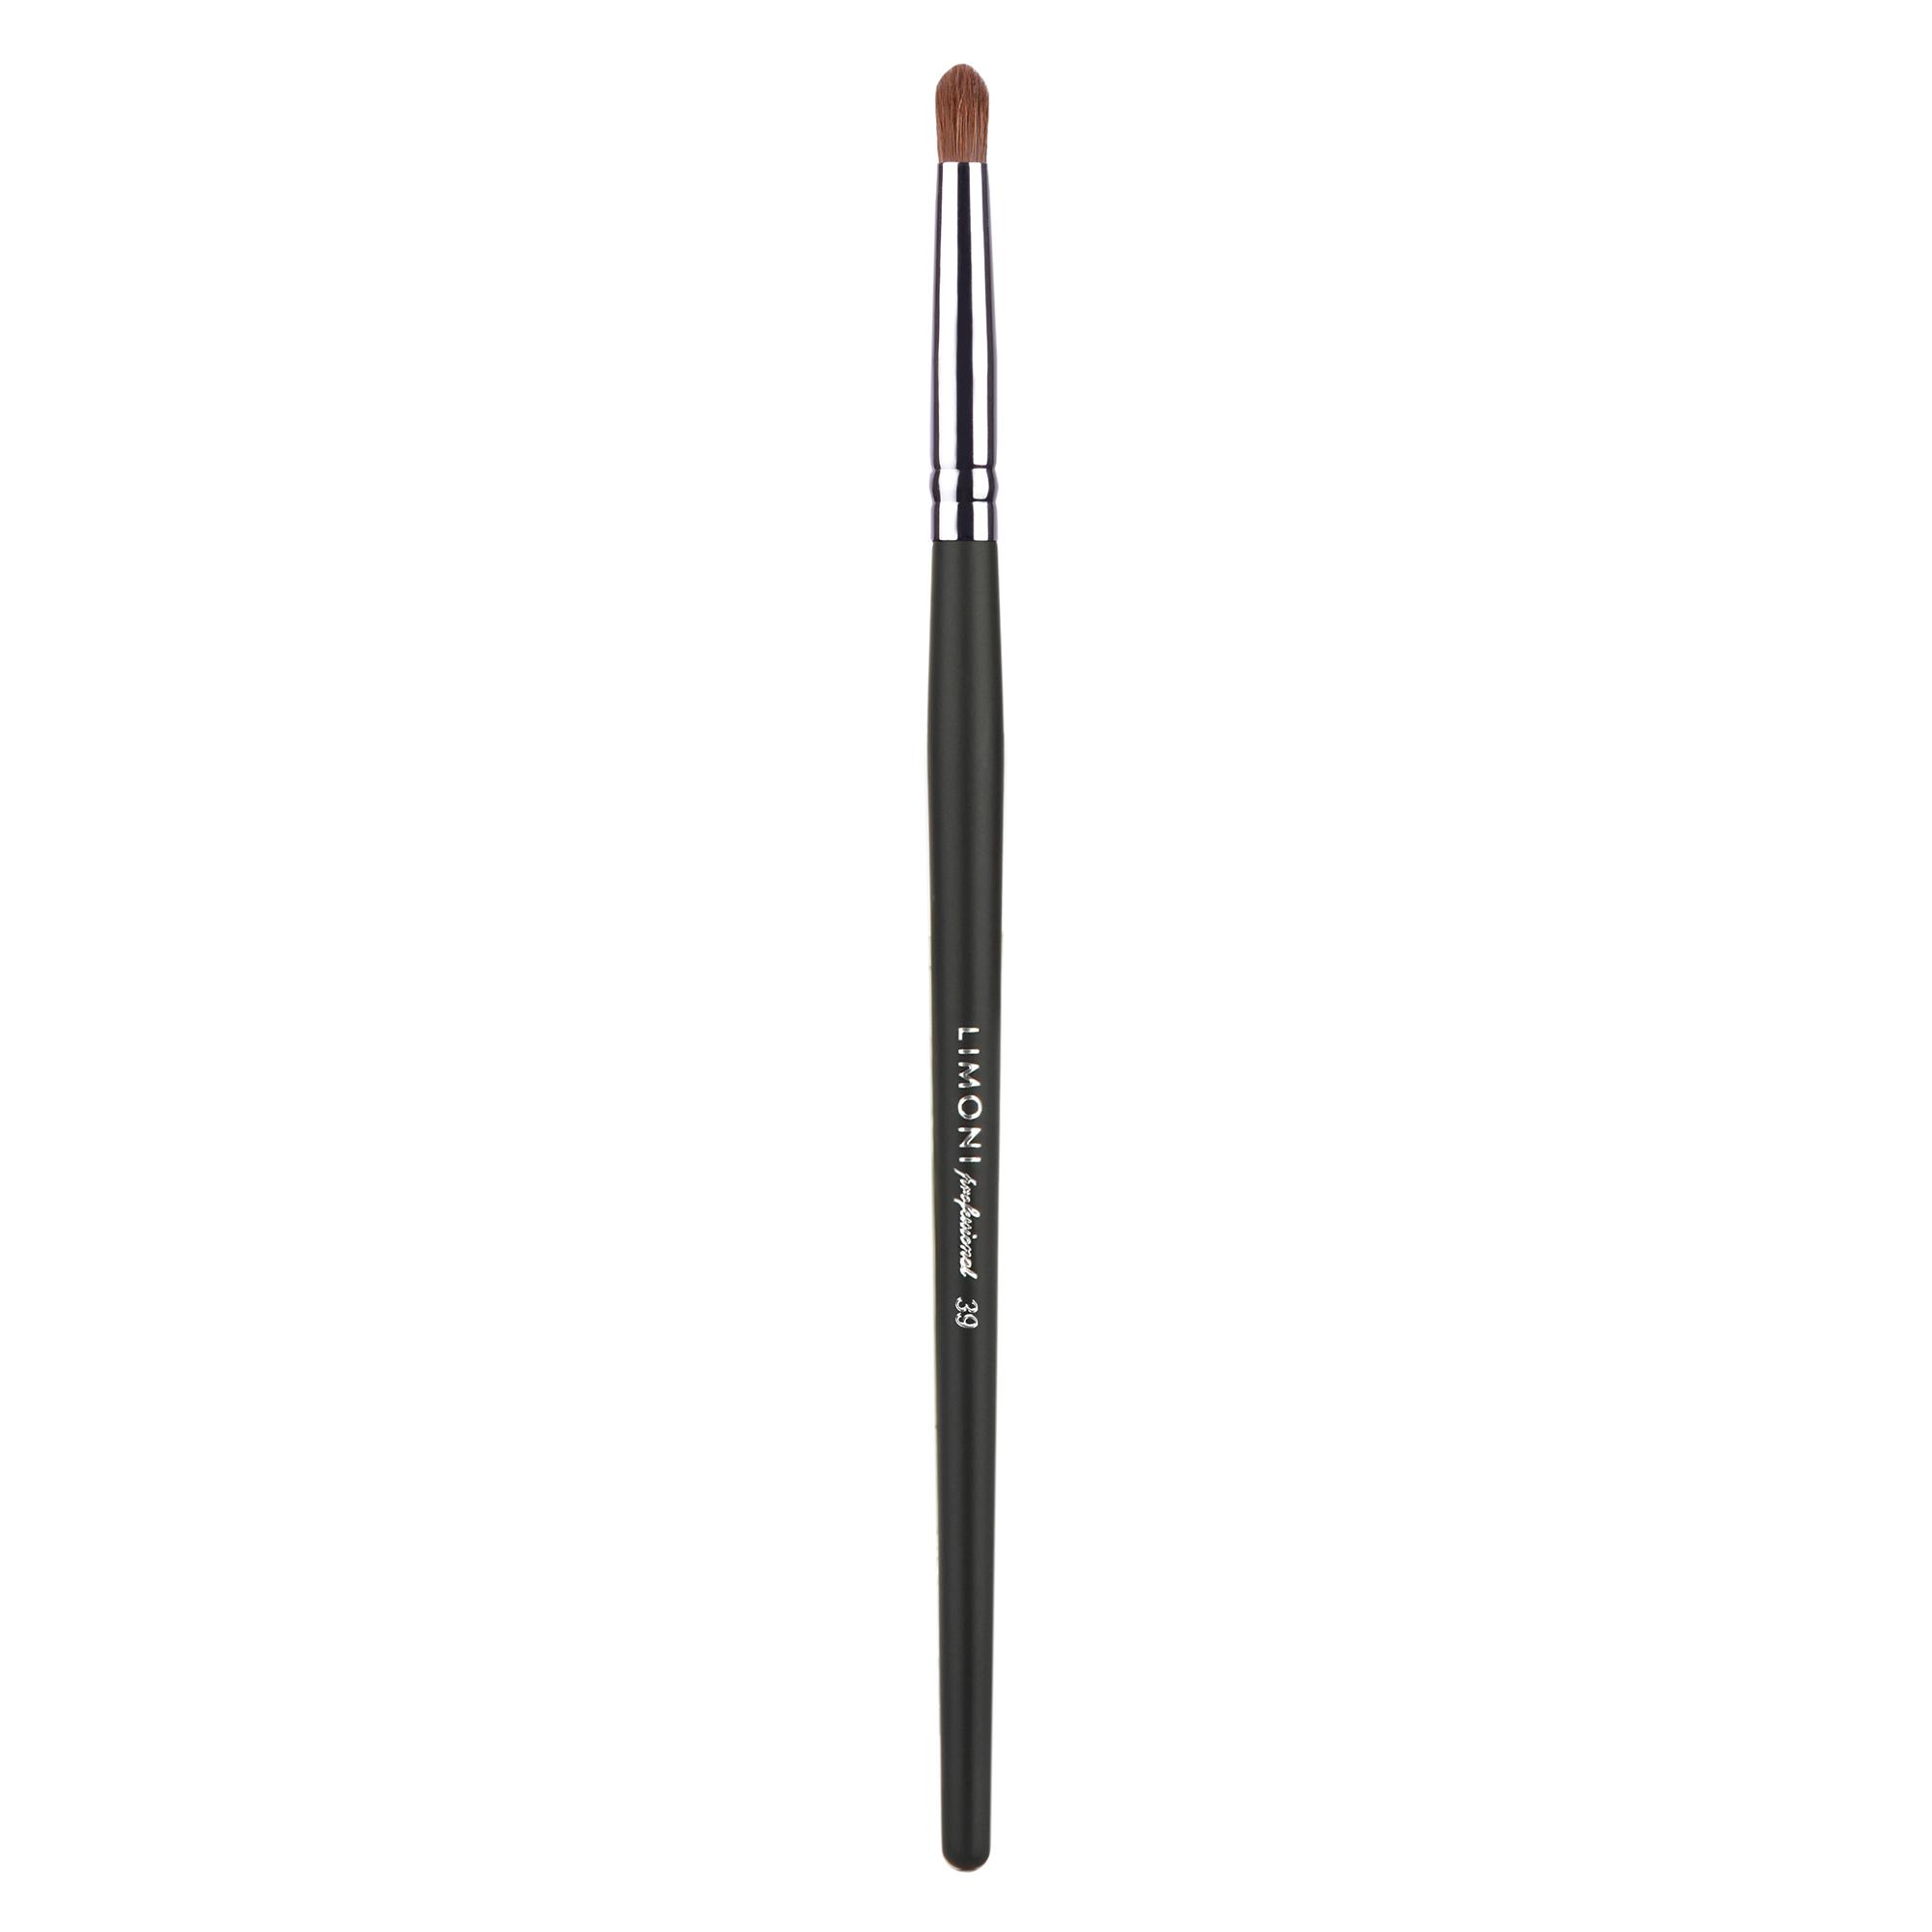 LIMONI Кисть-карандаш для растушевки подводки, контура №39 (соболь) / Professional